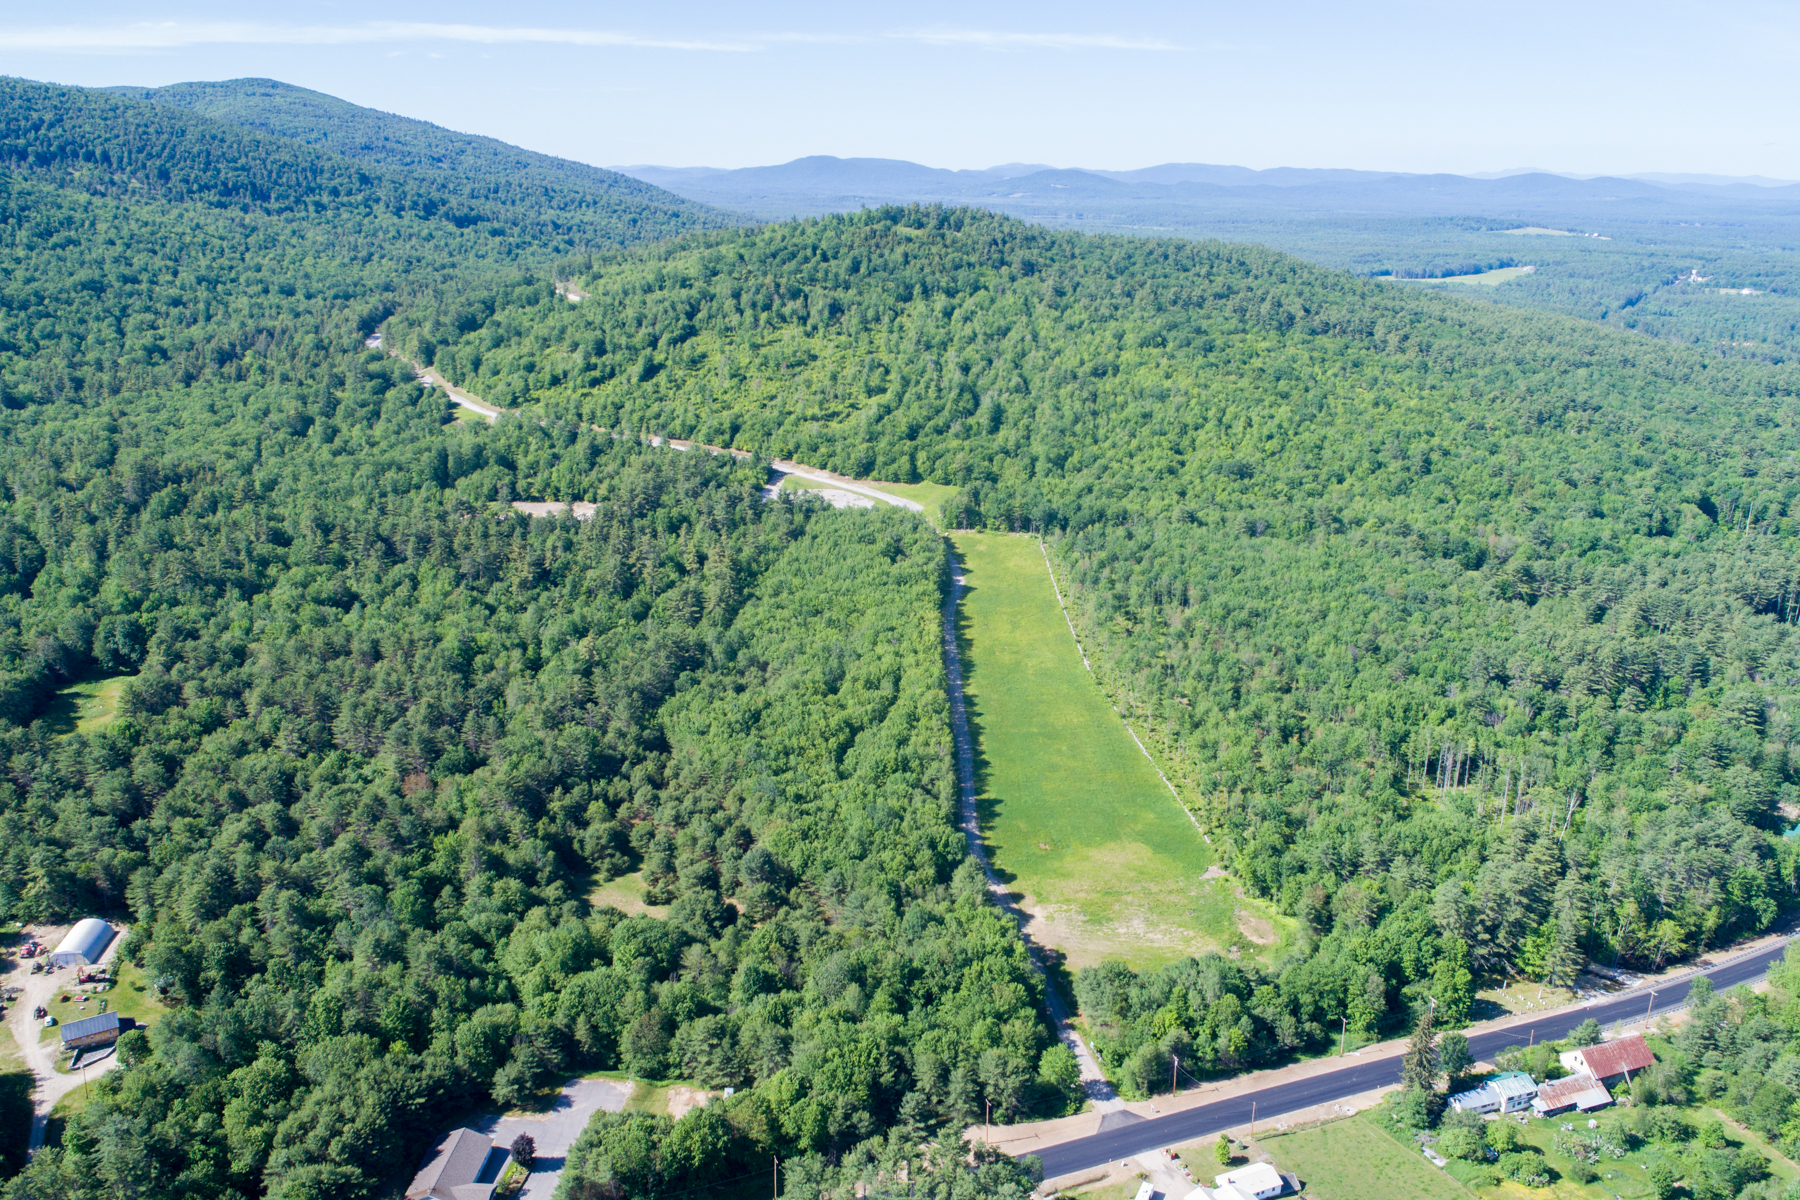 Land for Sale at 0 Tuckerman's Road Bridgton, Maine, 04009 United States